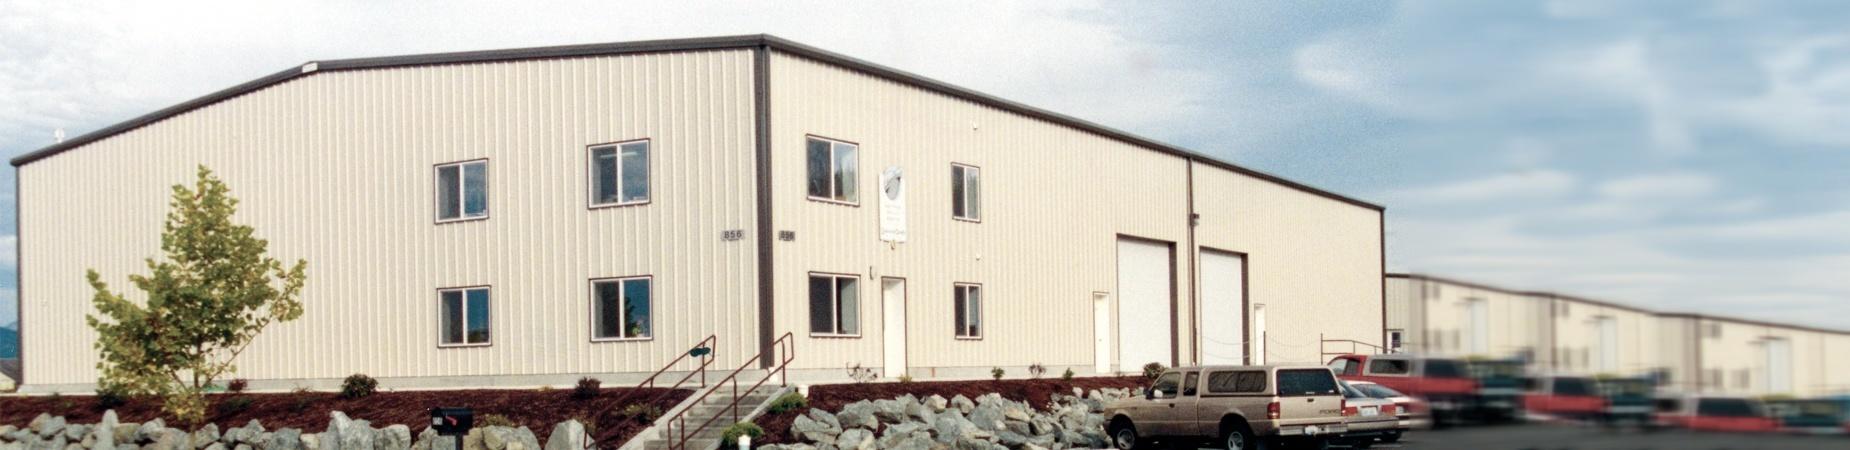 slider-industrial-building